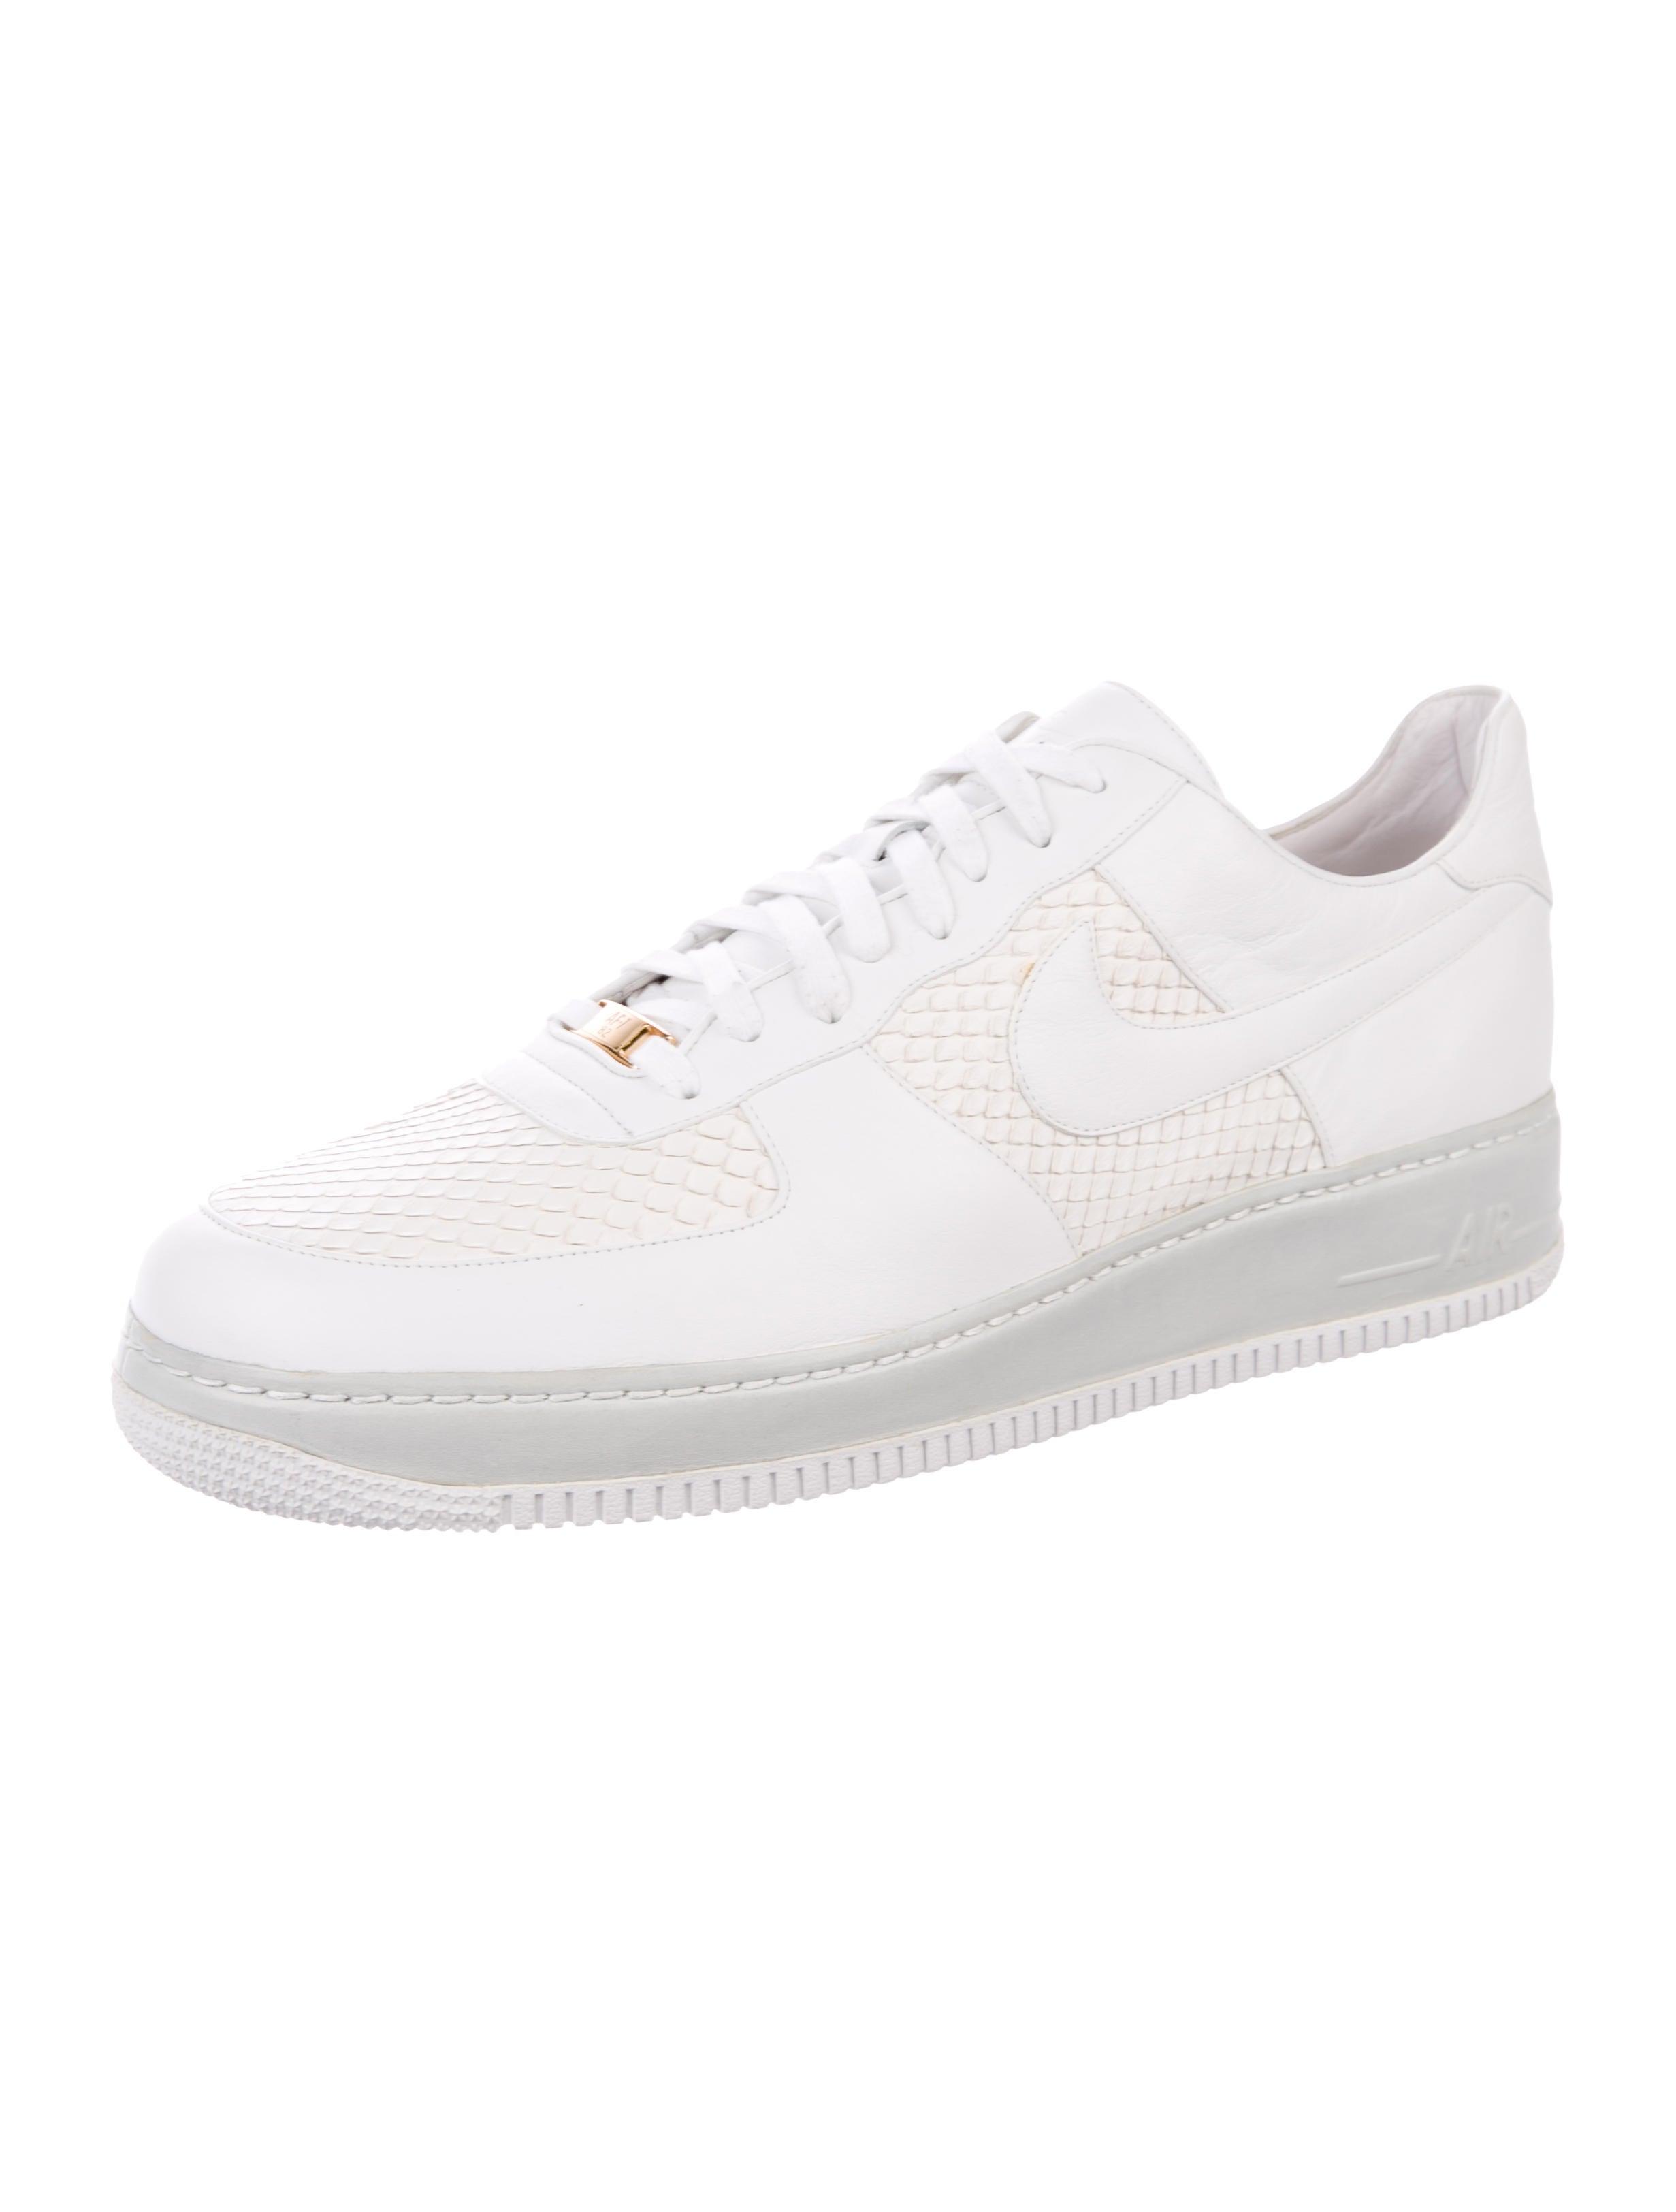 Nike Air Force 1 Lux Anaconda 25th